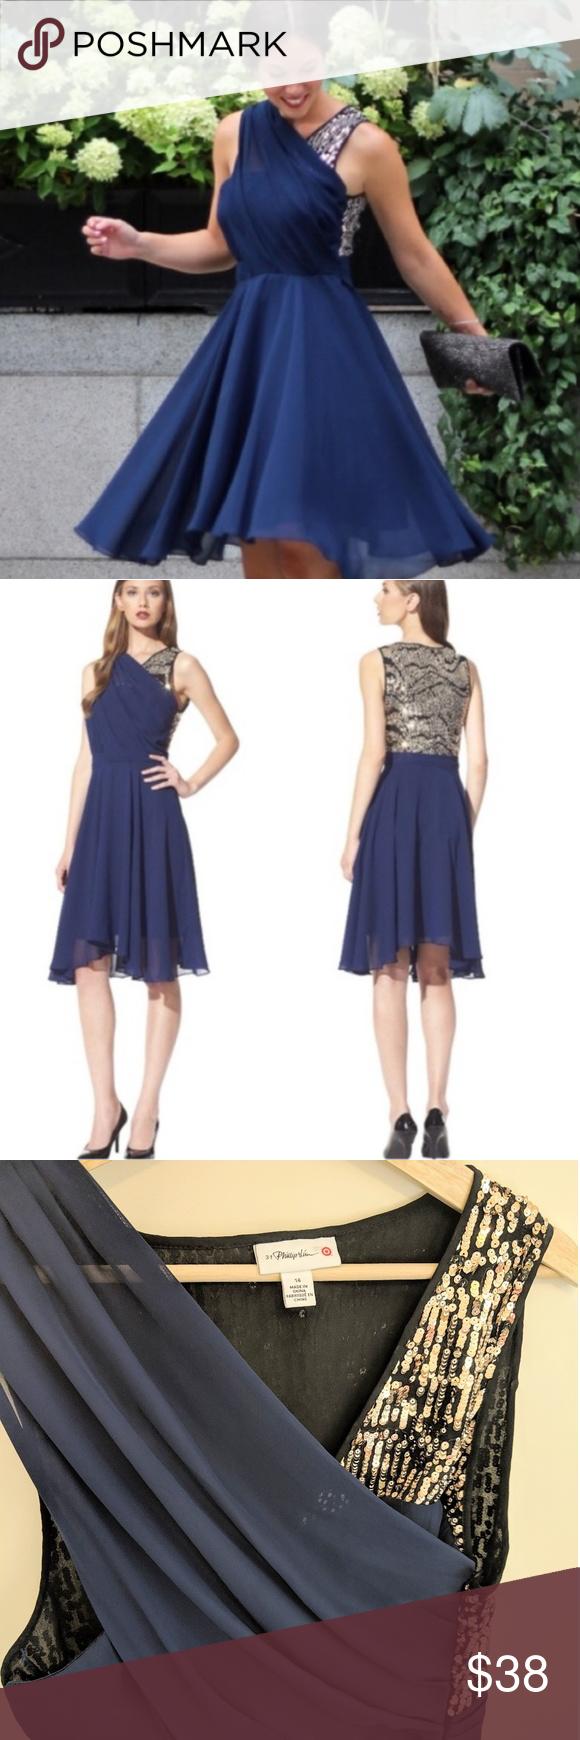 3 1 Phillip Lim Target Collab Prom Gown Sz 14 Target Dresses Fashion Dresses [ 1740 x 580 Pixel ]